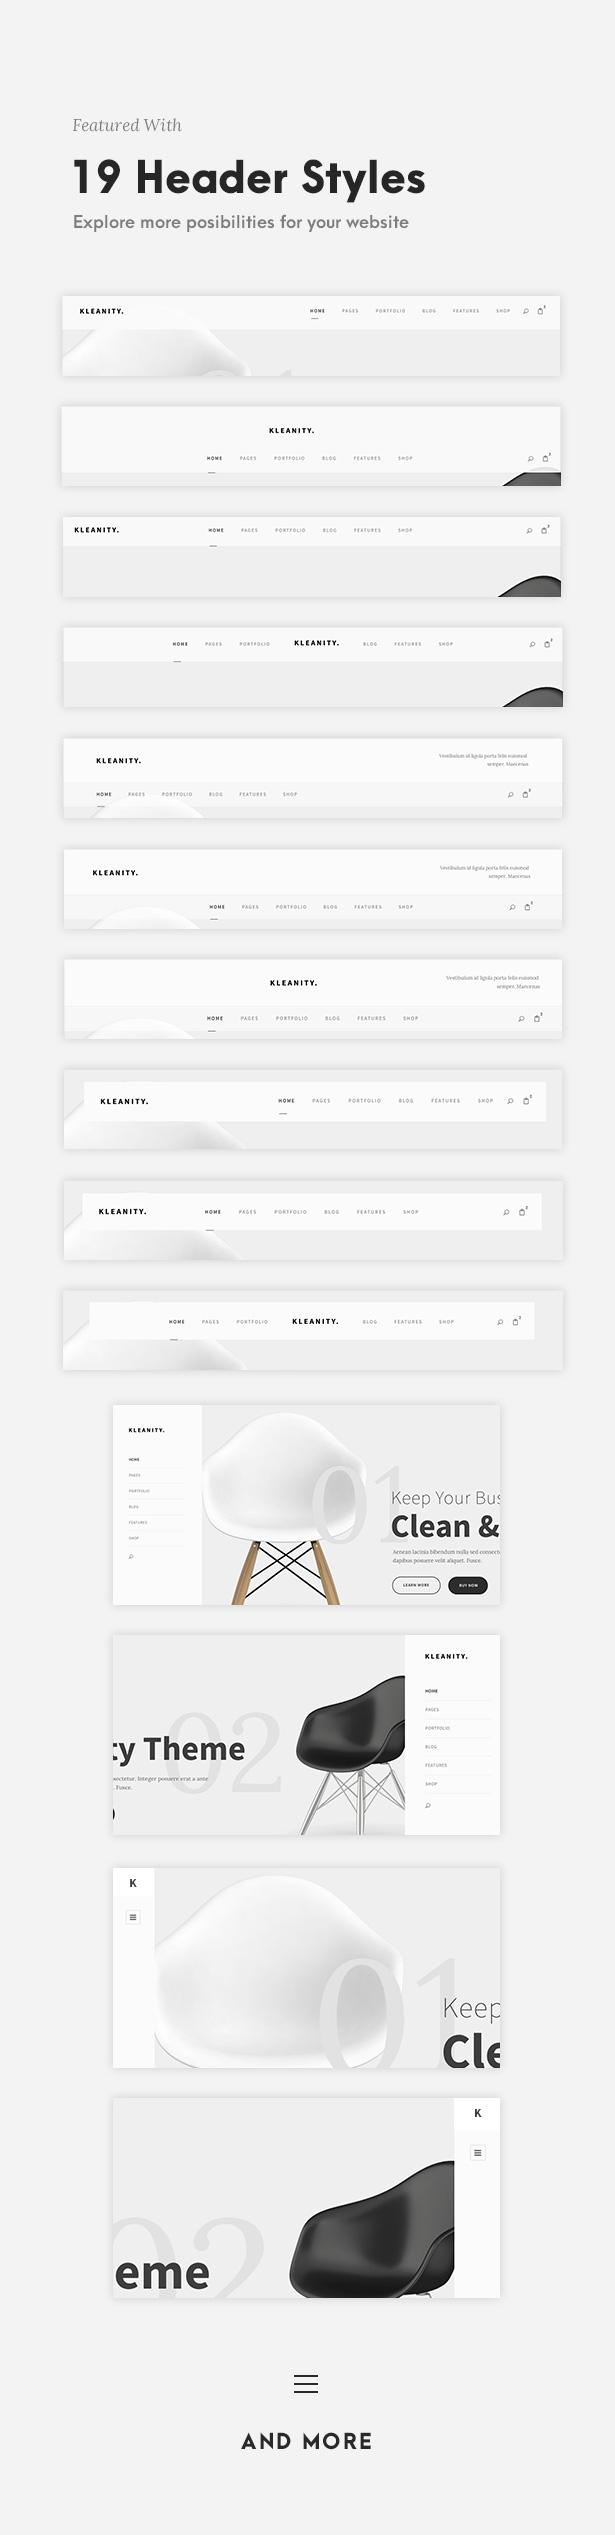 Kleanity - سمة WordPress بسيطة / محفظة إبداعية - 5